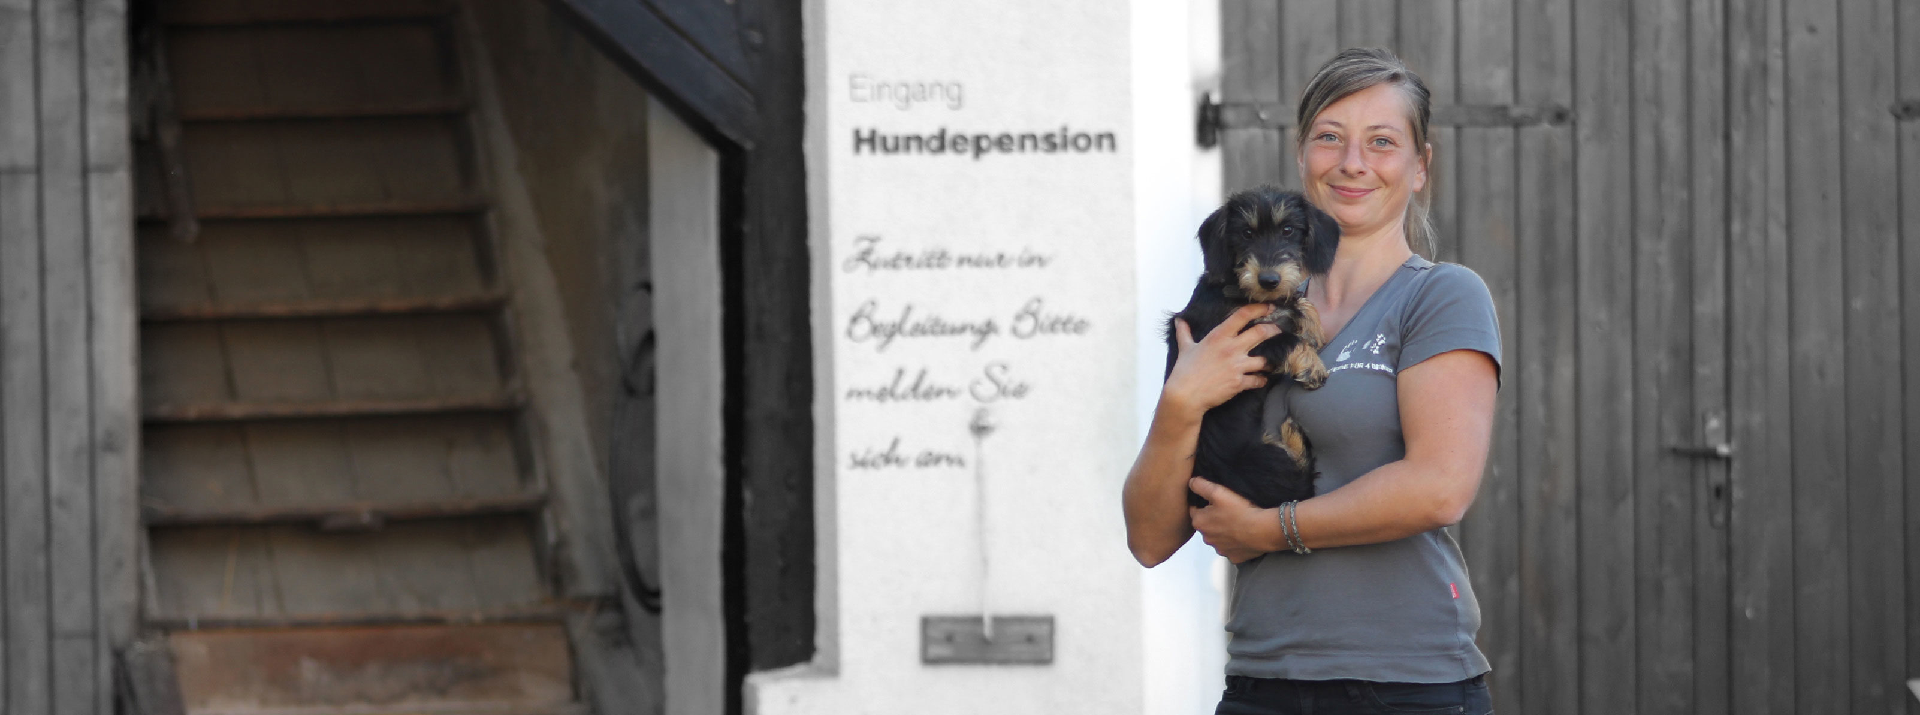 Hundeberaterin_Ines-Zuschke_Hundepension-01